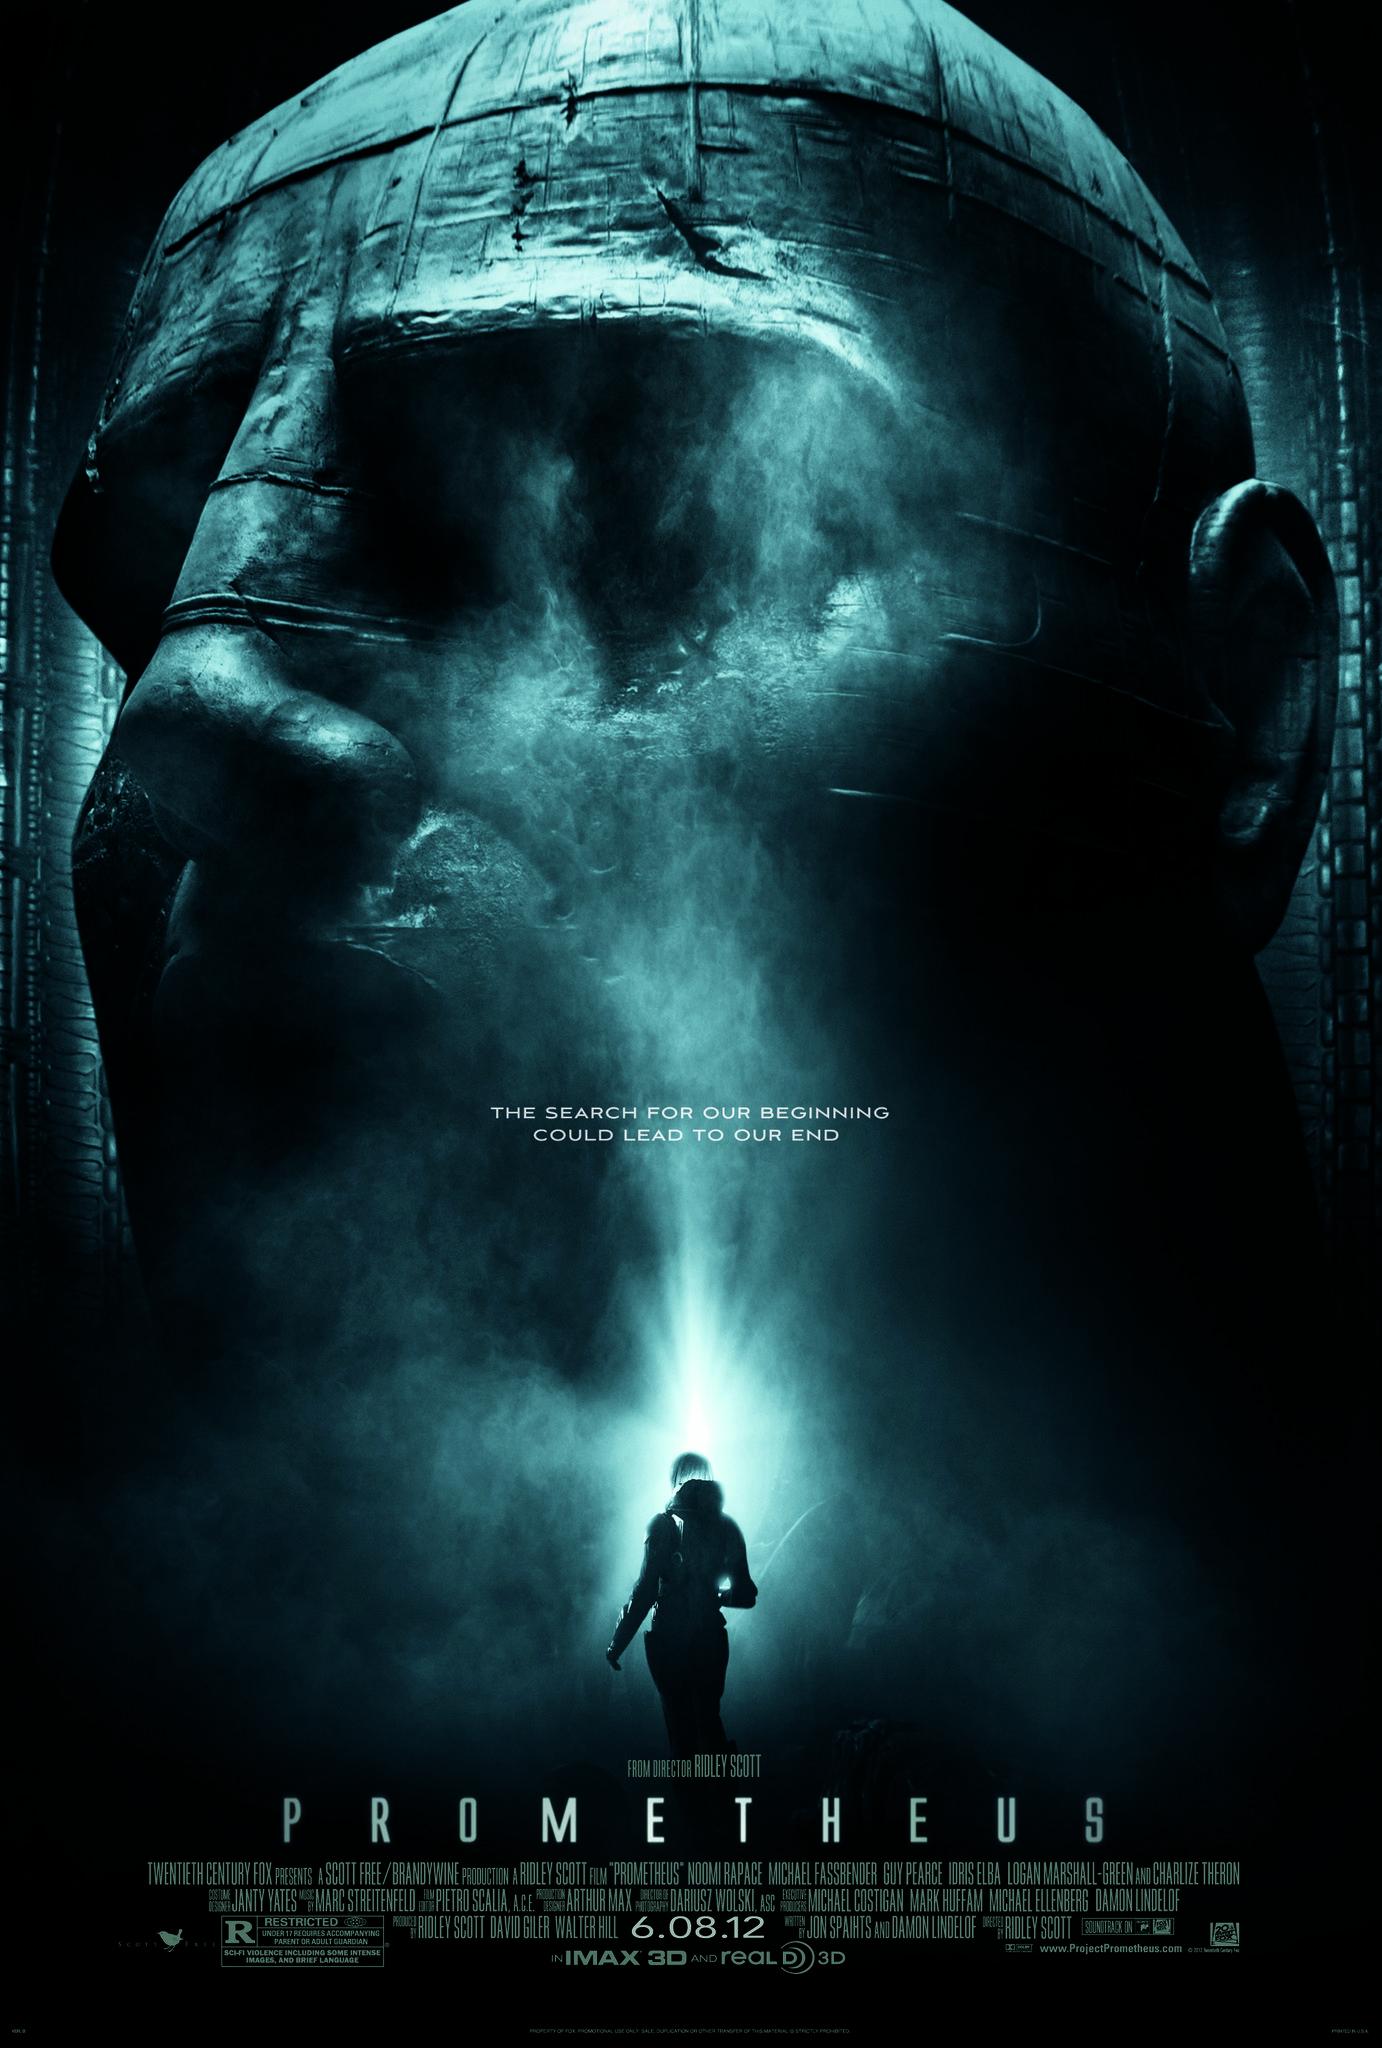 Prometheus 2012 Movie Posters 2010s In 2019 Pinterest